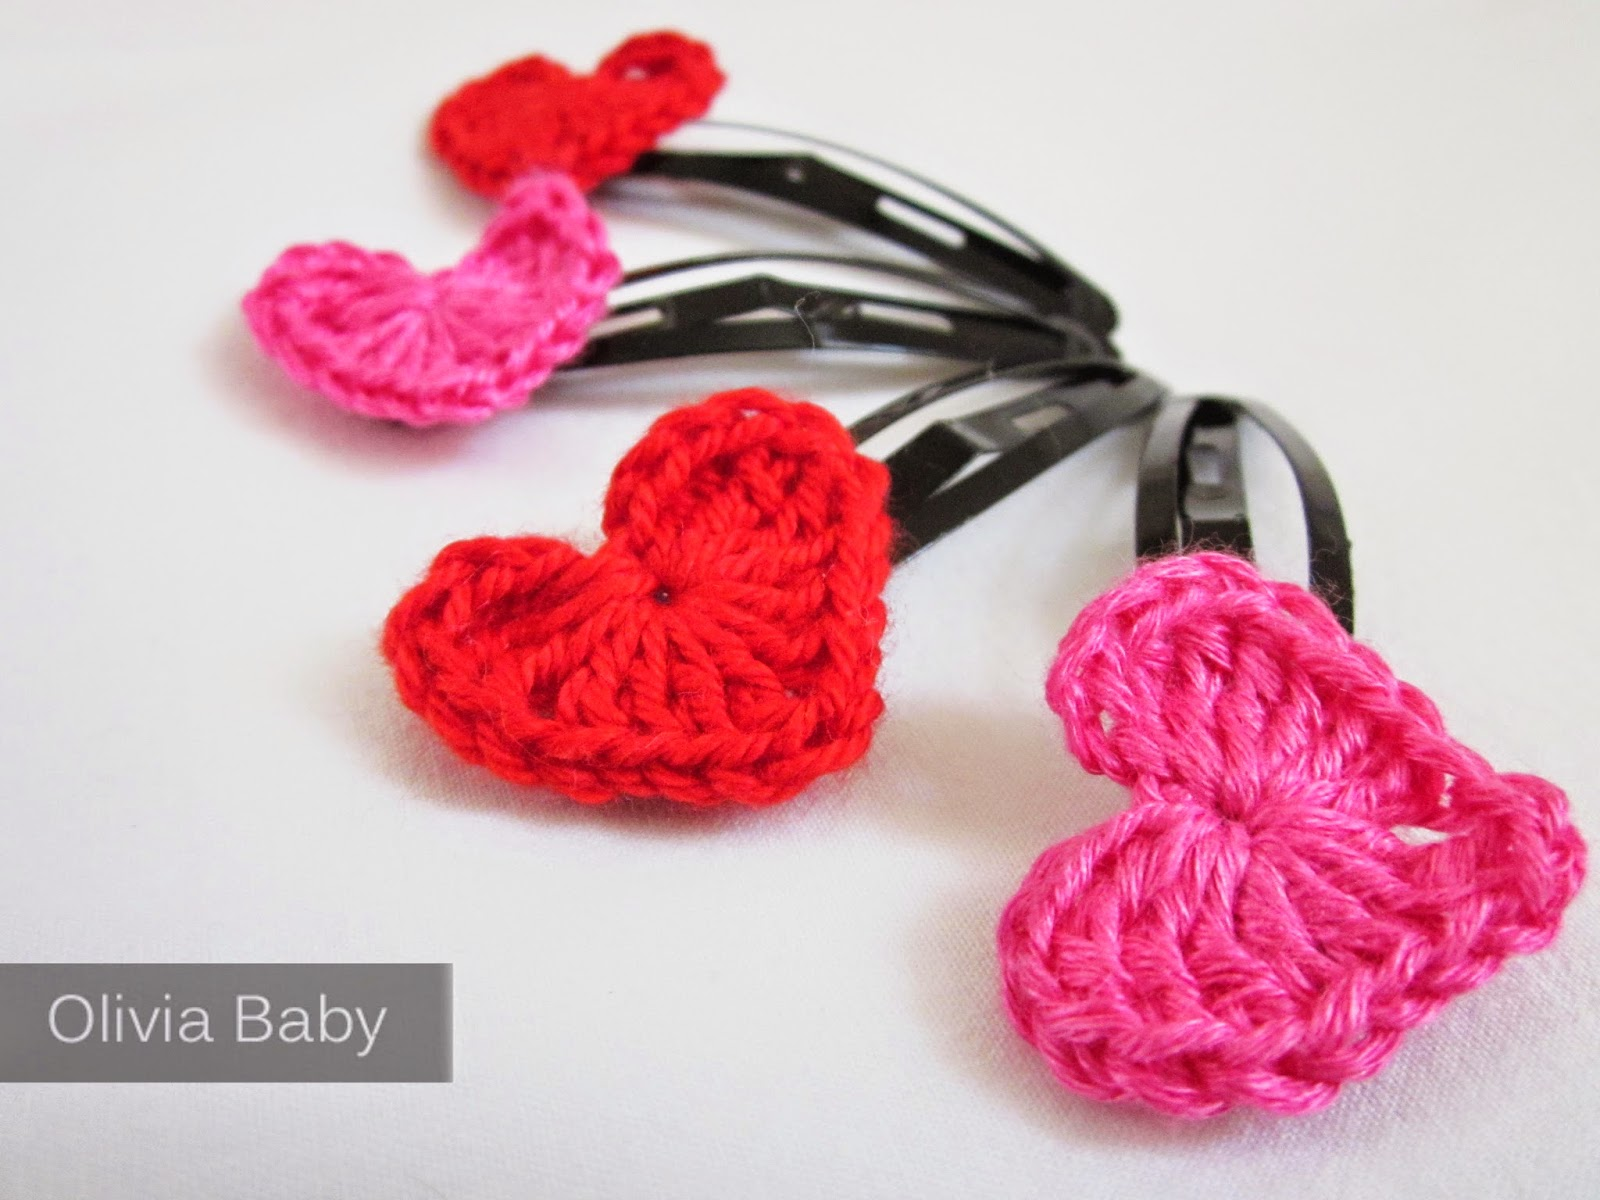 Knitting Blog: Кучка заколок...